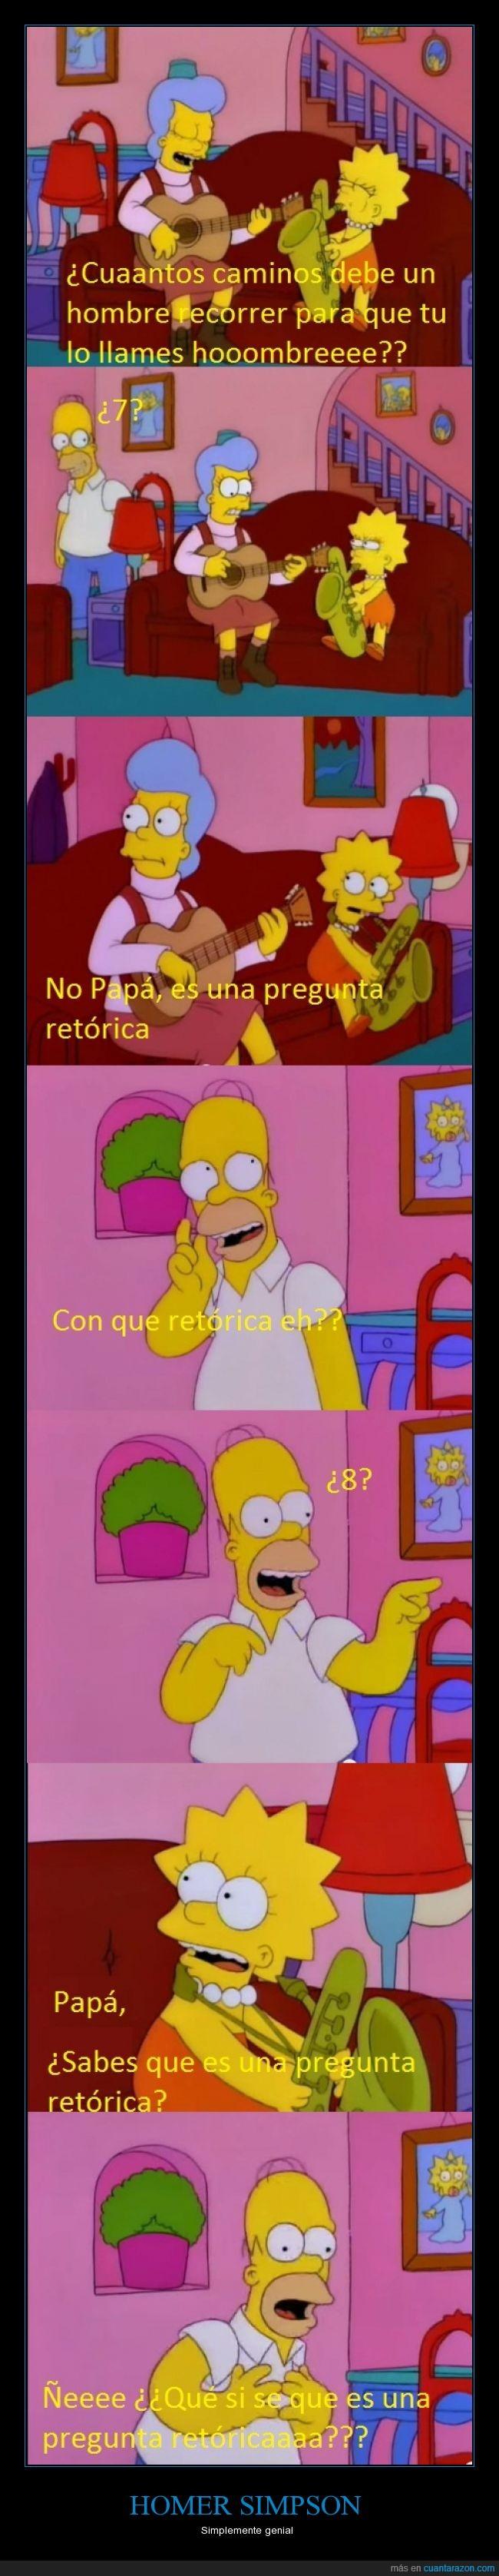 caminos,cancion,Homer,lisa,mona,pregunta,recorrer,retórica,Simpson